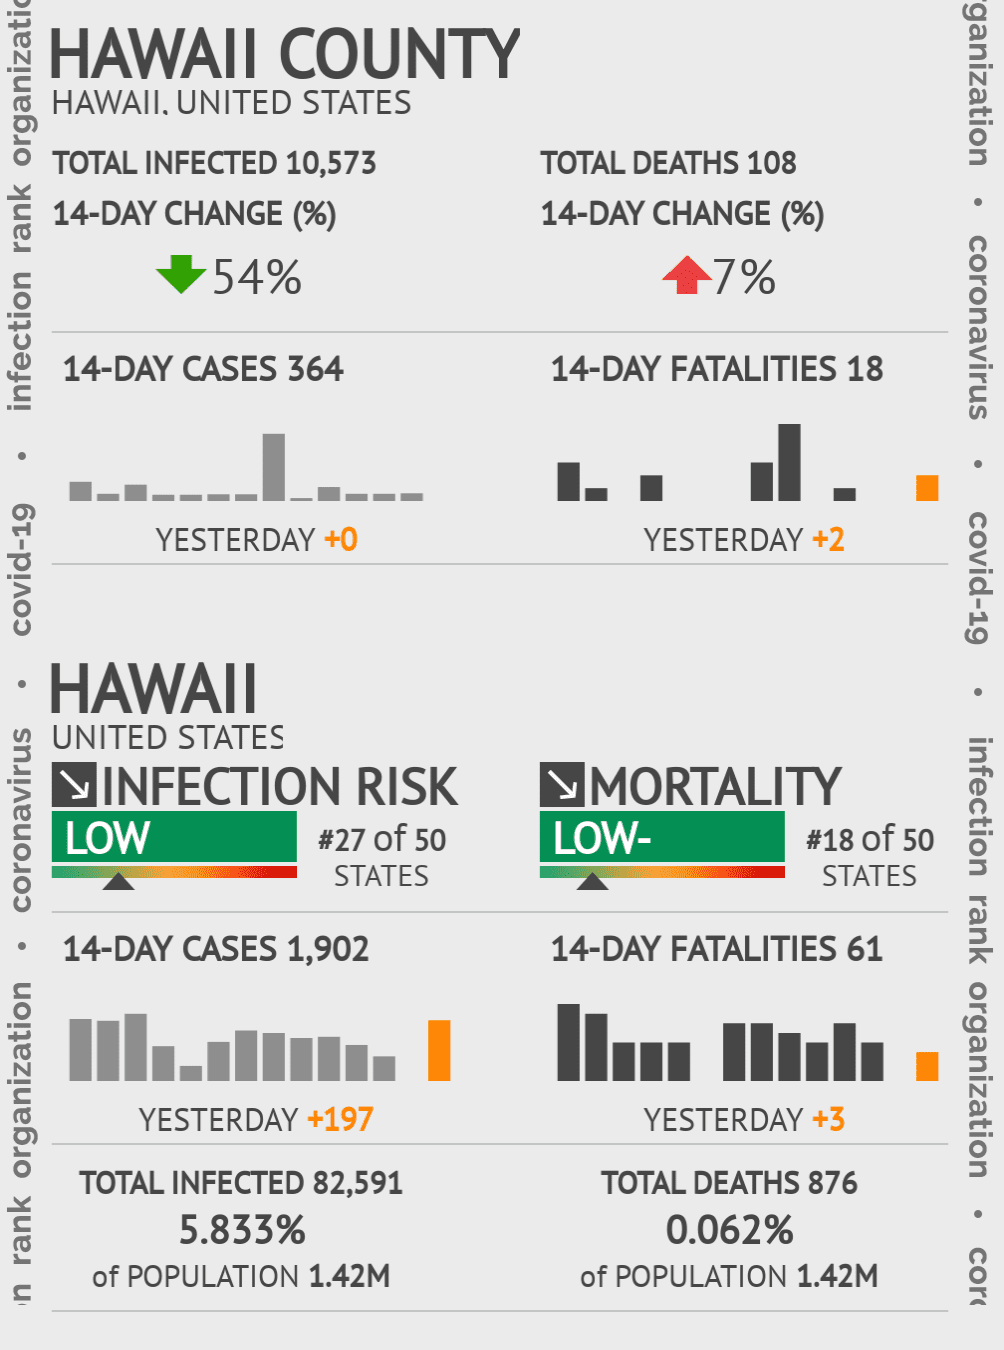 Hawaii County Coronavirus Covid-19 Risk of Infection on July 24, 2021